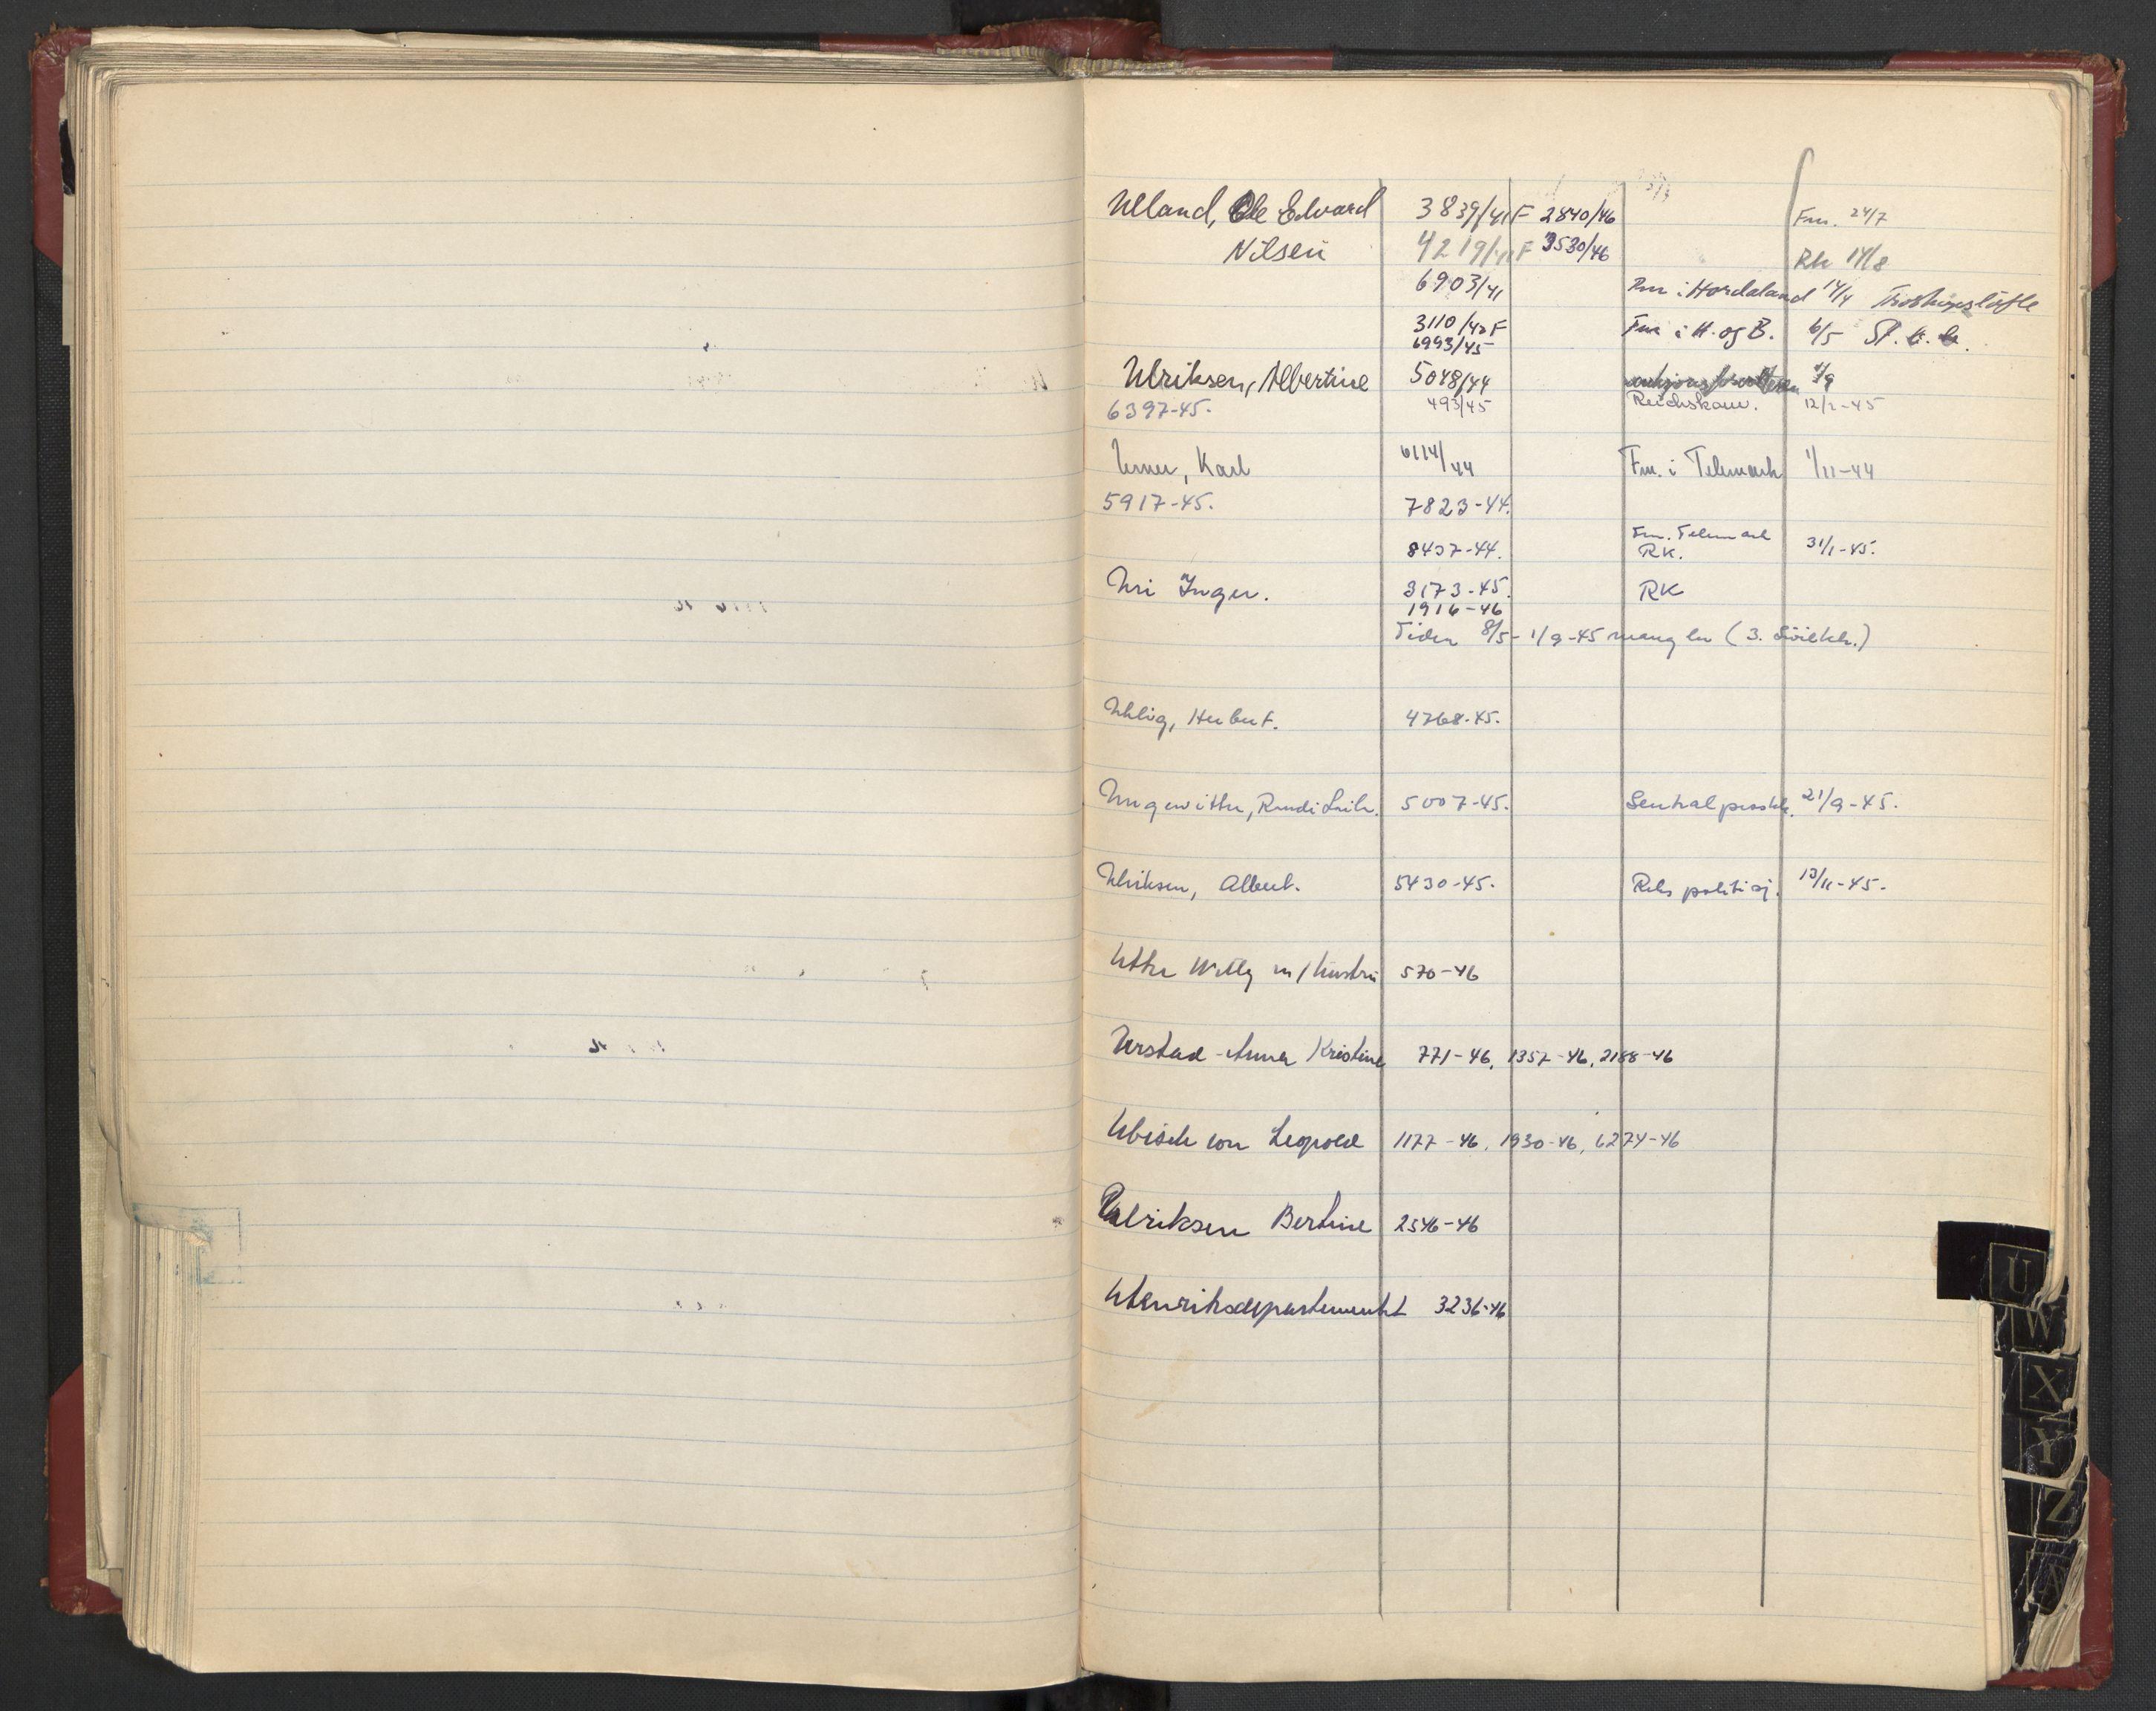 RA, Justisdepartementet, 3. politikontor P3, C/Cc/L0002: Journalregister over statsborgersaker, 1940-1946, s. 104